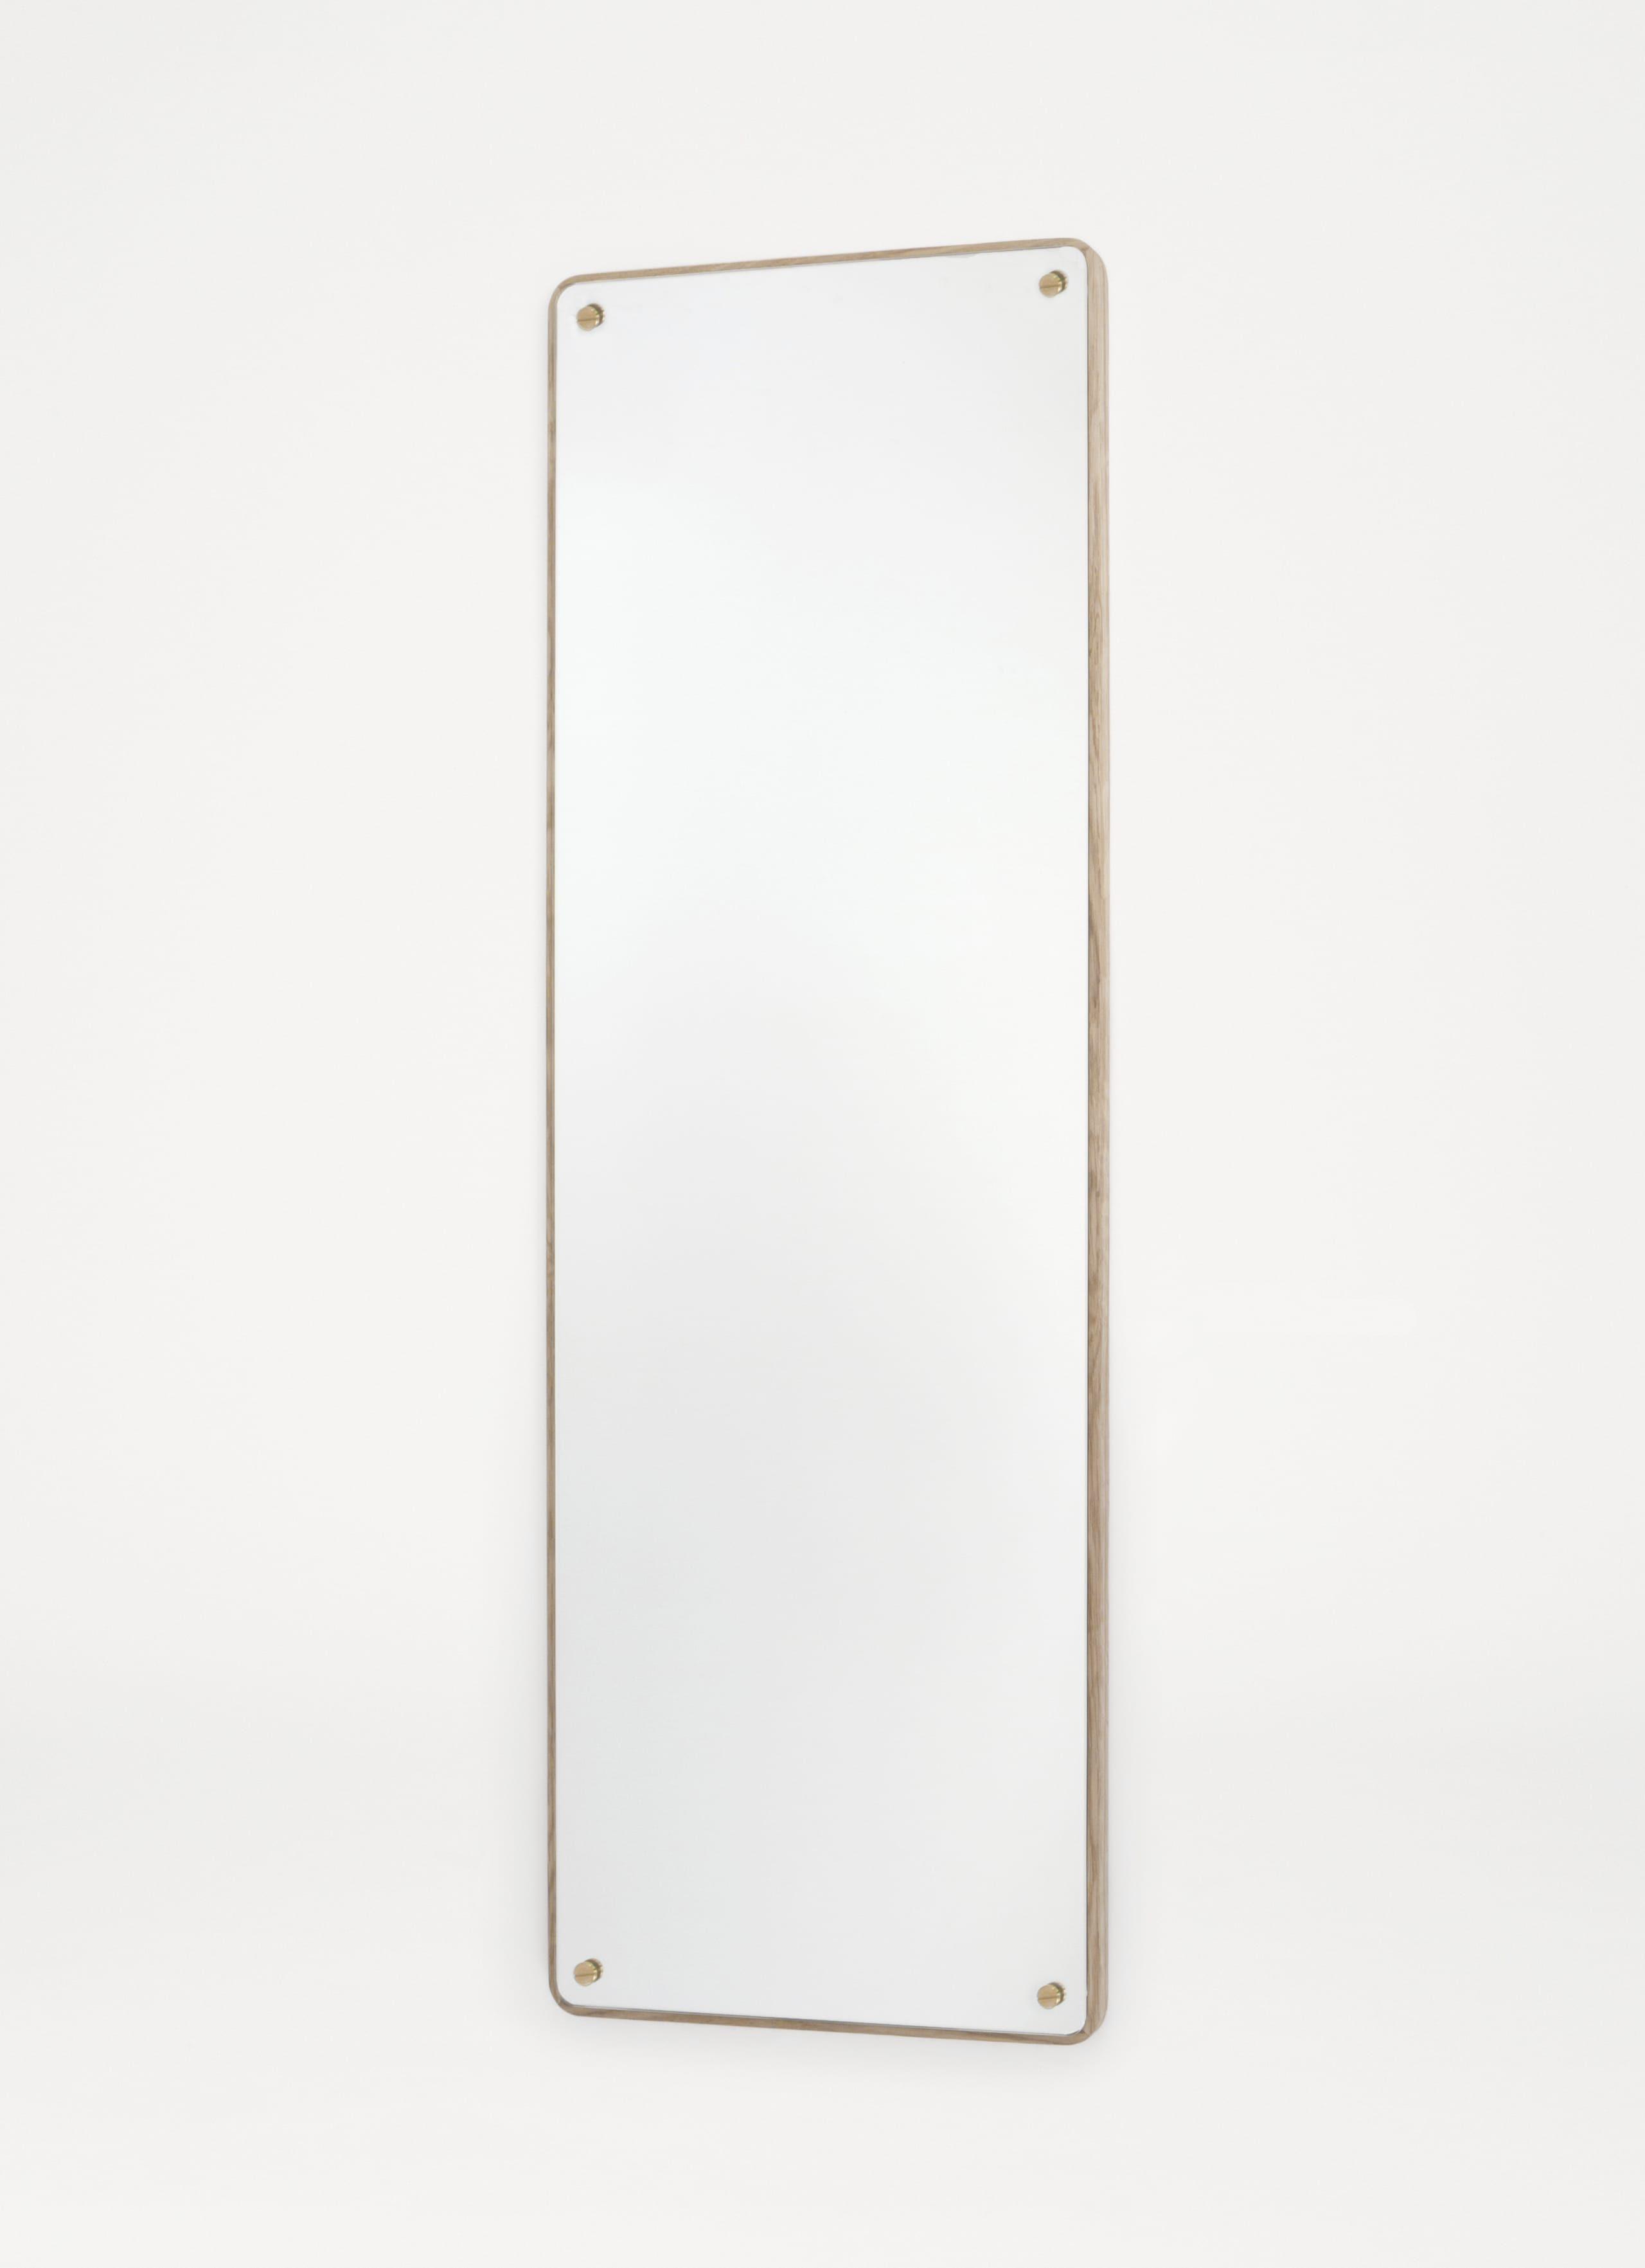 Frama - RM 1 - Rectangular Mirror - Large